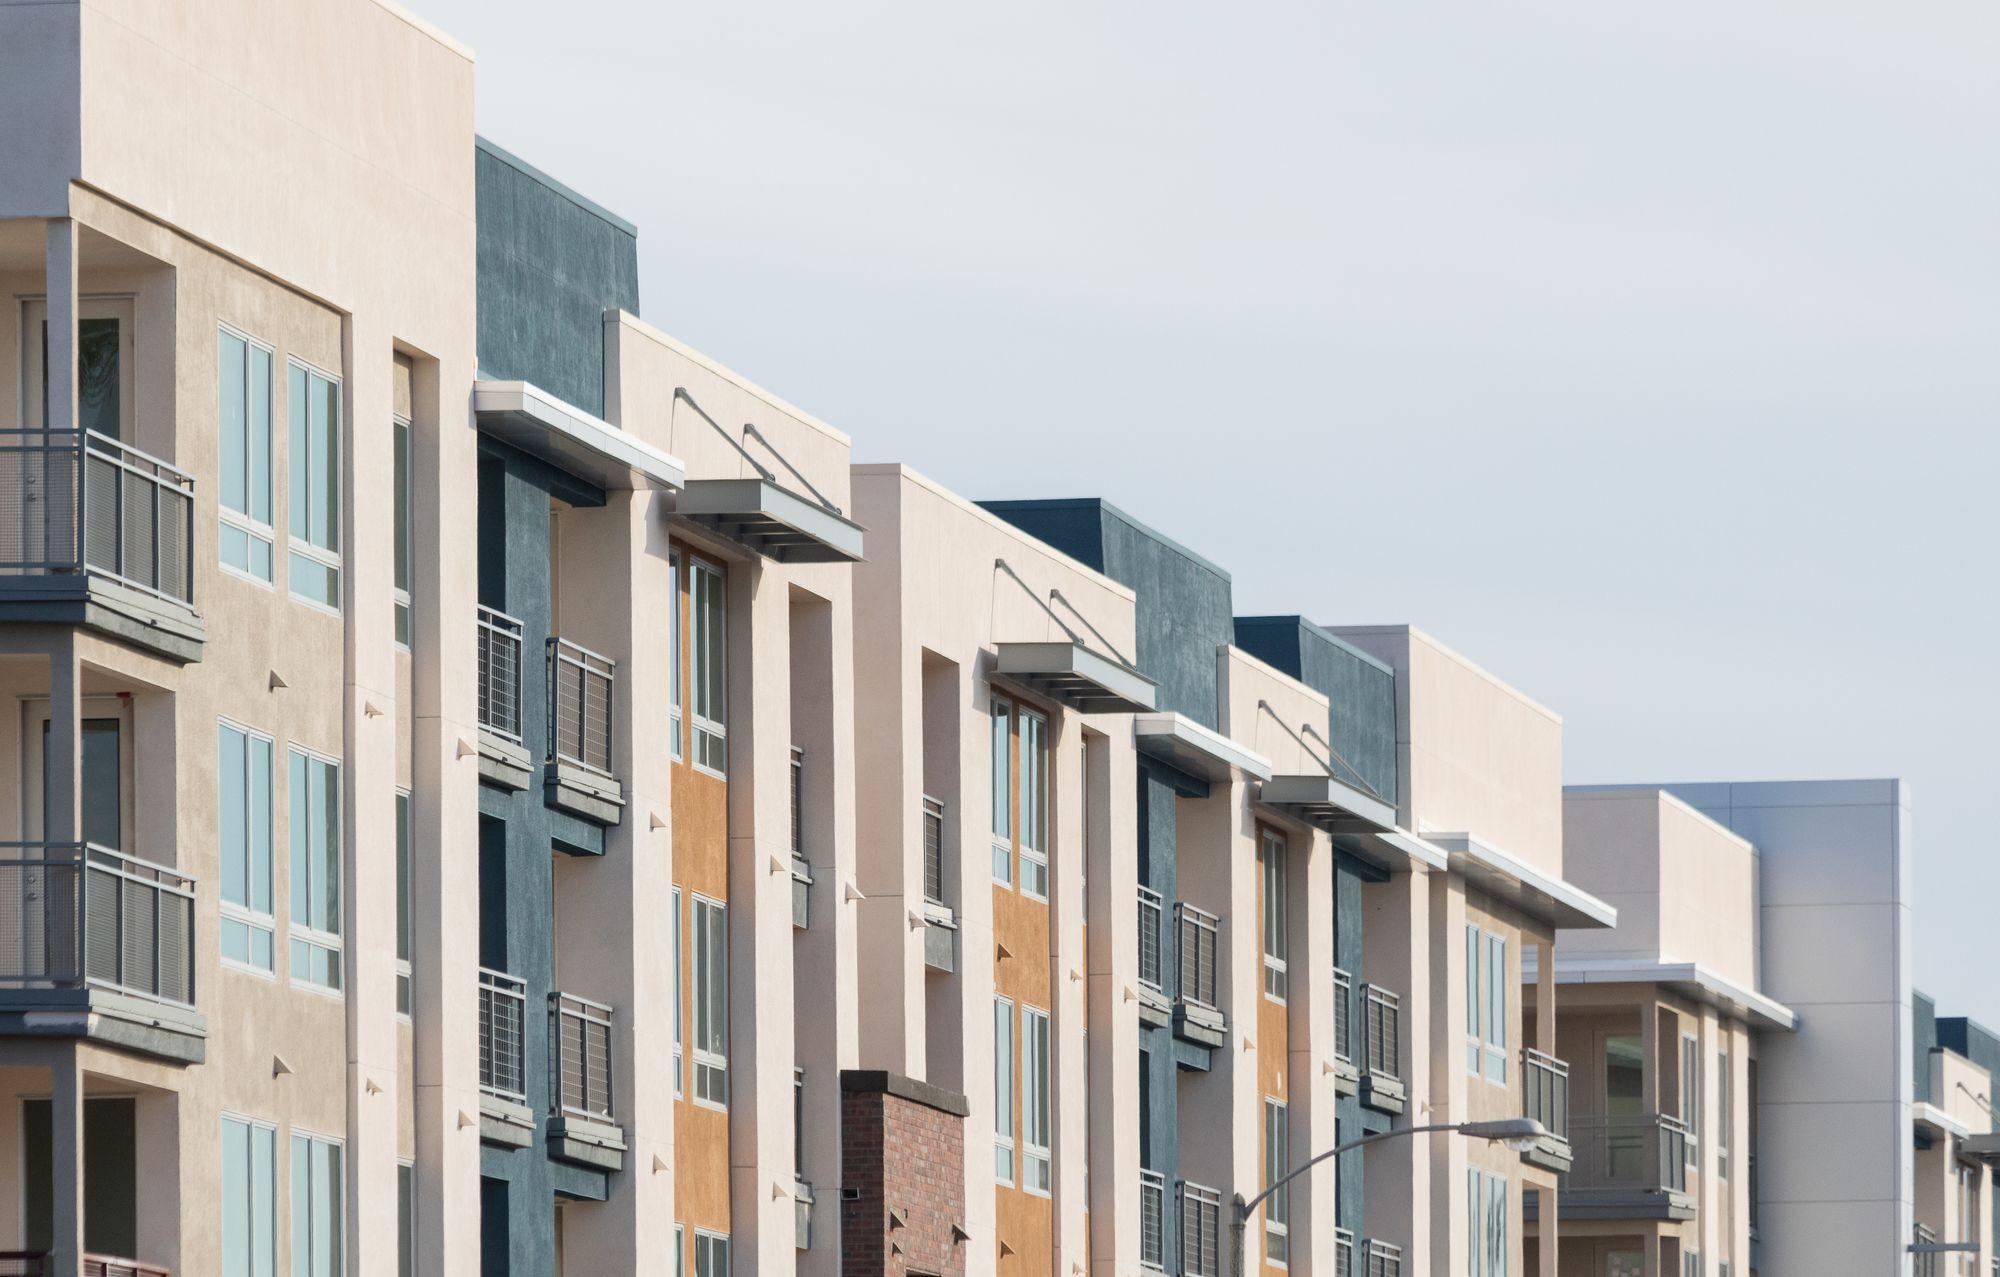 Apartments Near Biola 770 South Harbor for Biola University Students in La Mirada, CA